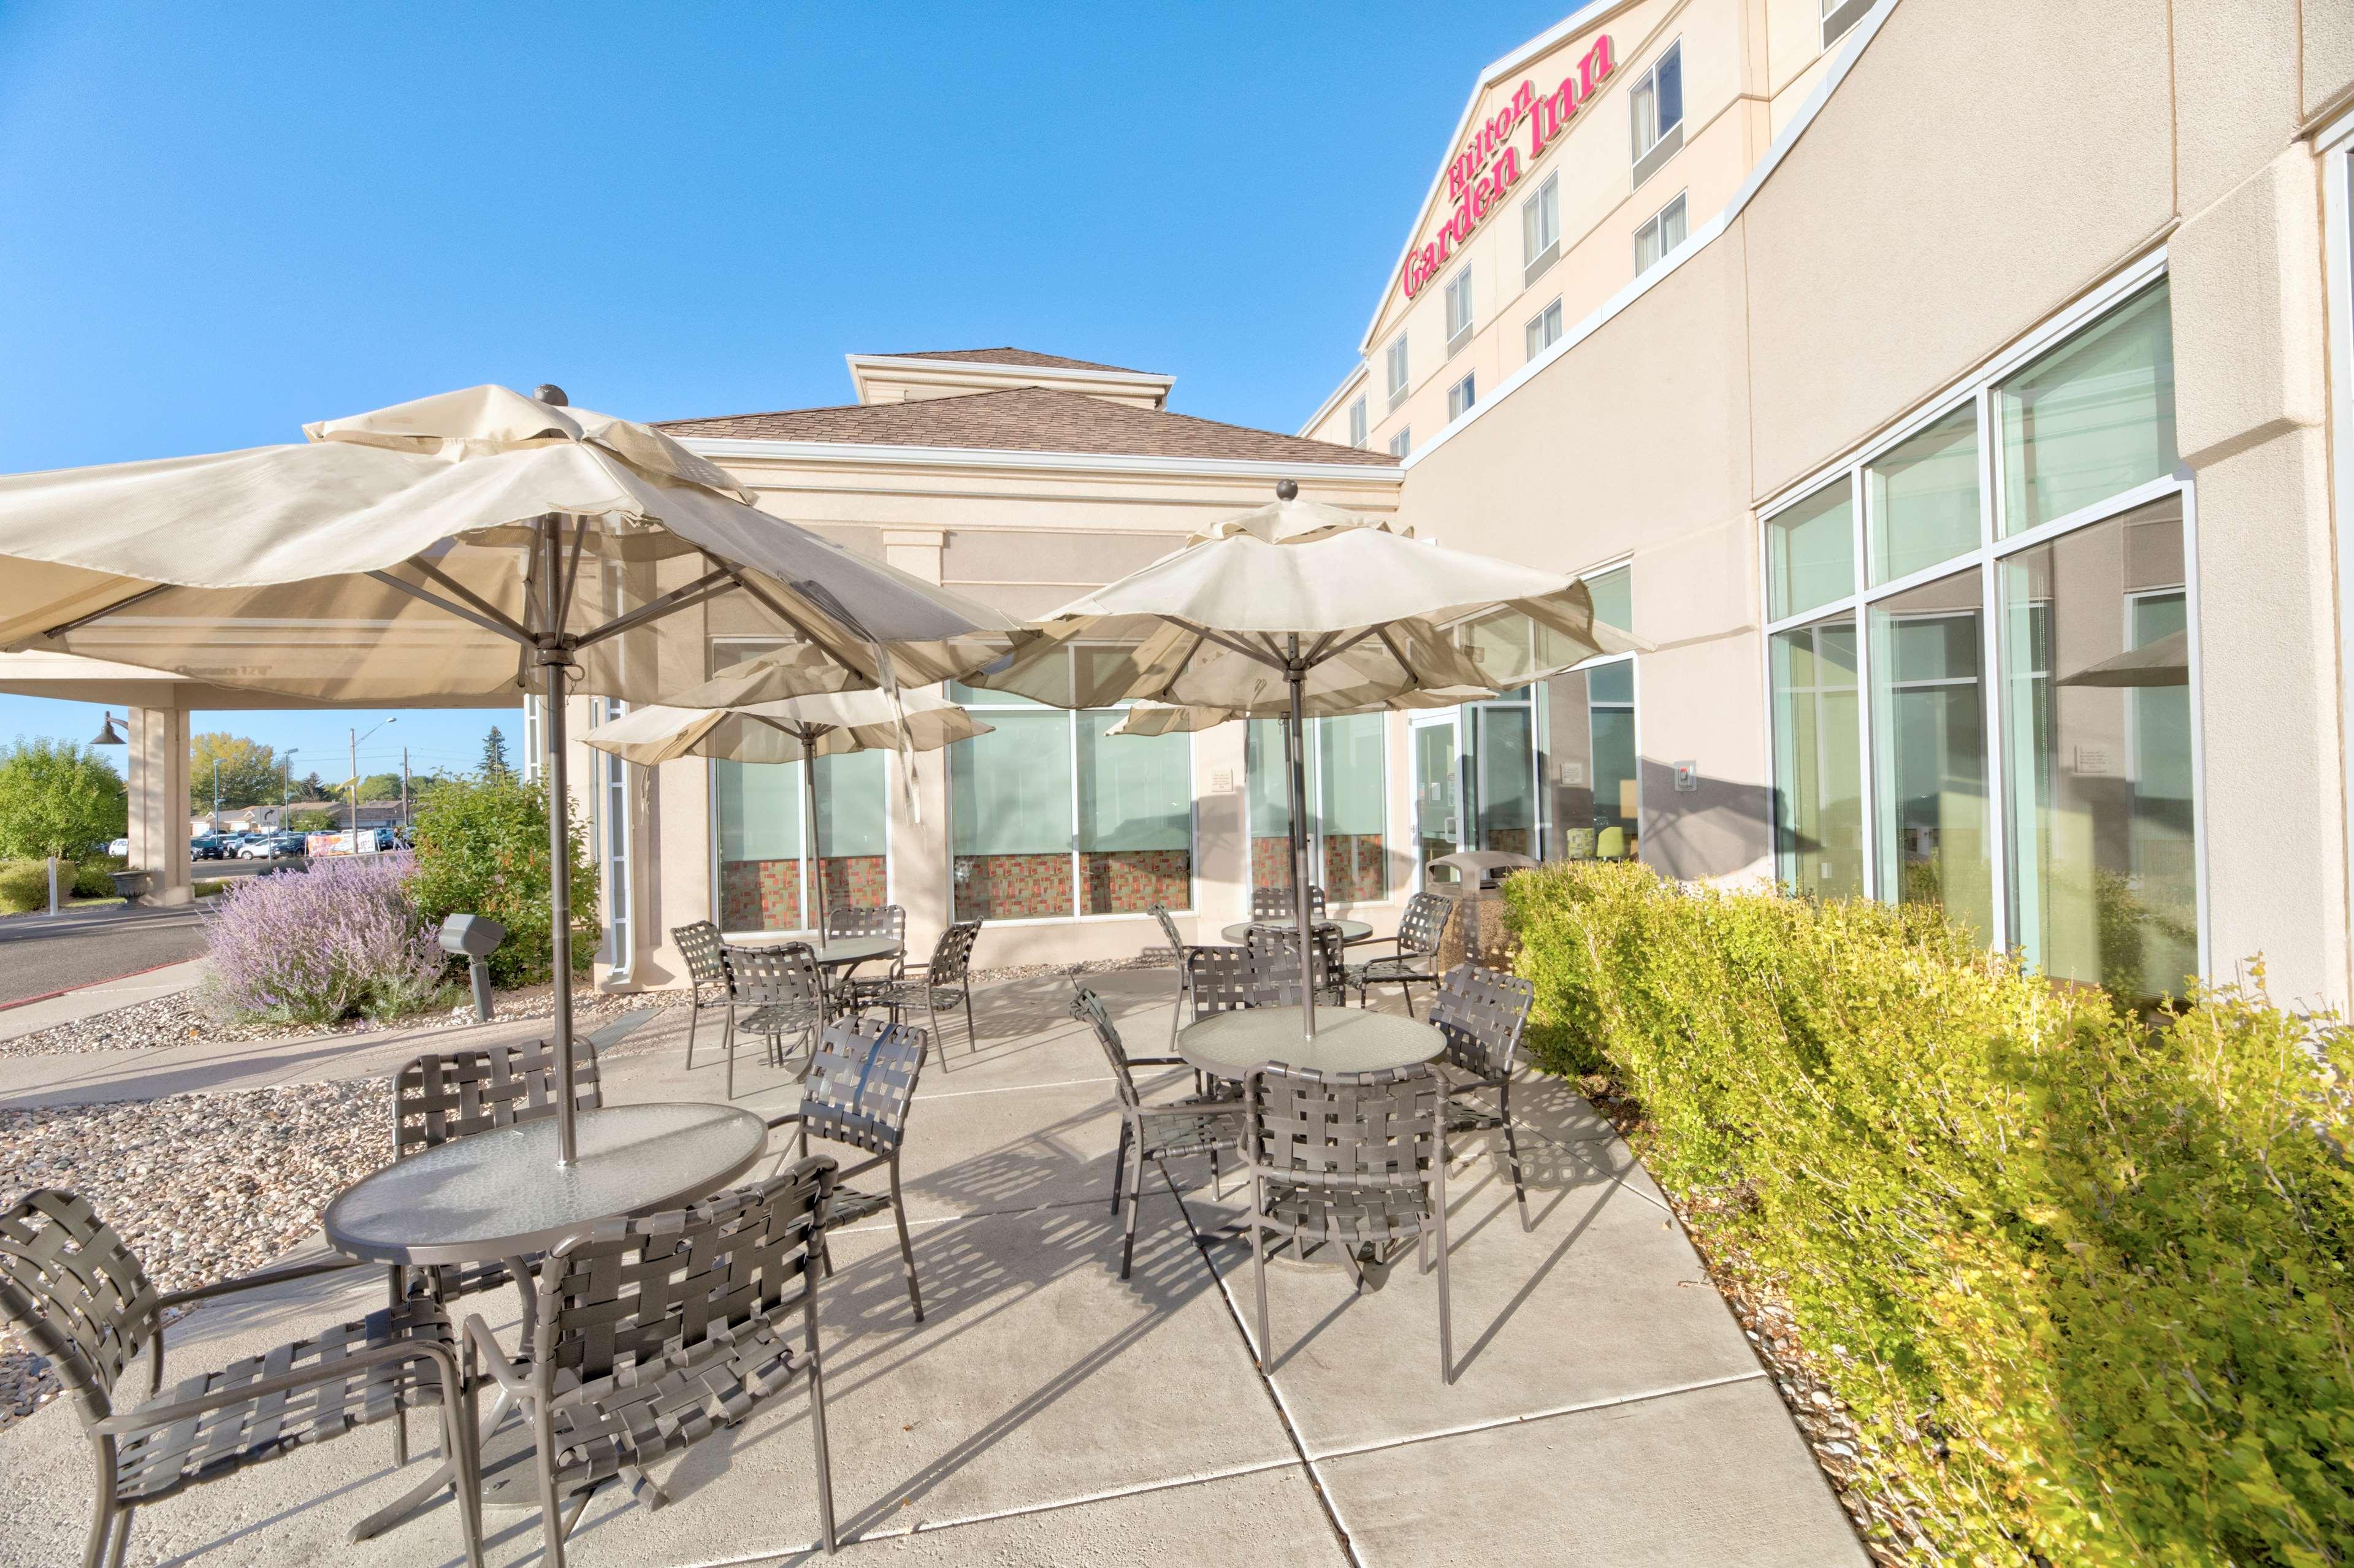 Hilton Garden Inn Laramie image 0